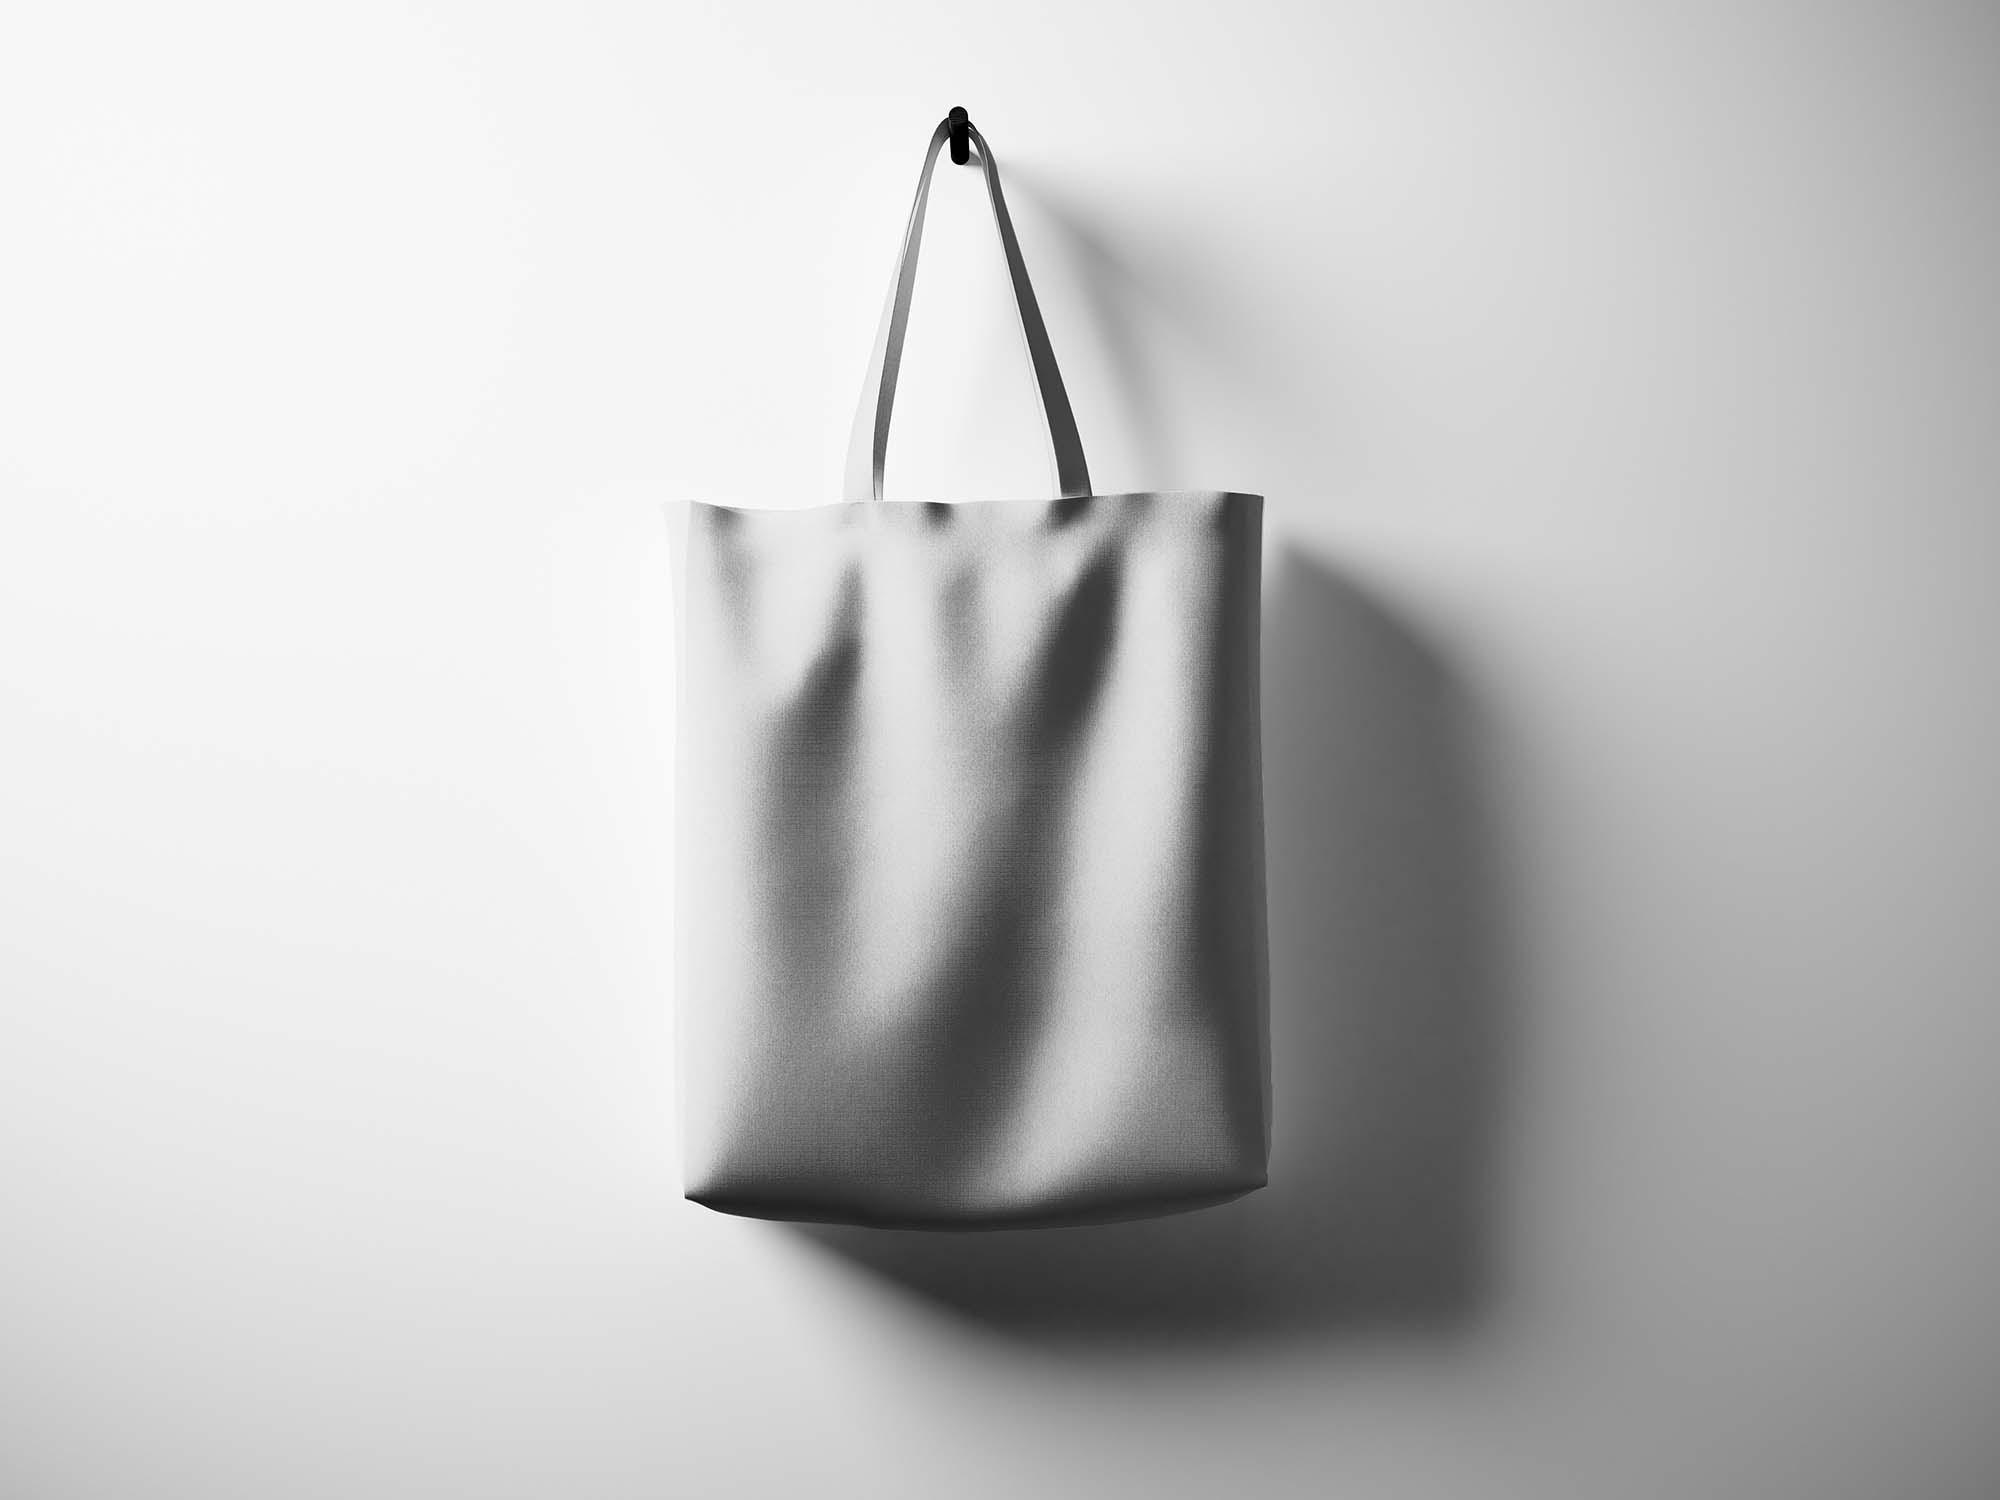 Hanging Handbag Mockup 2